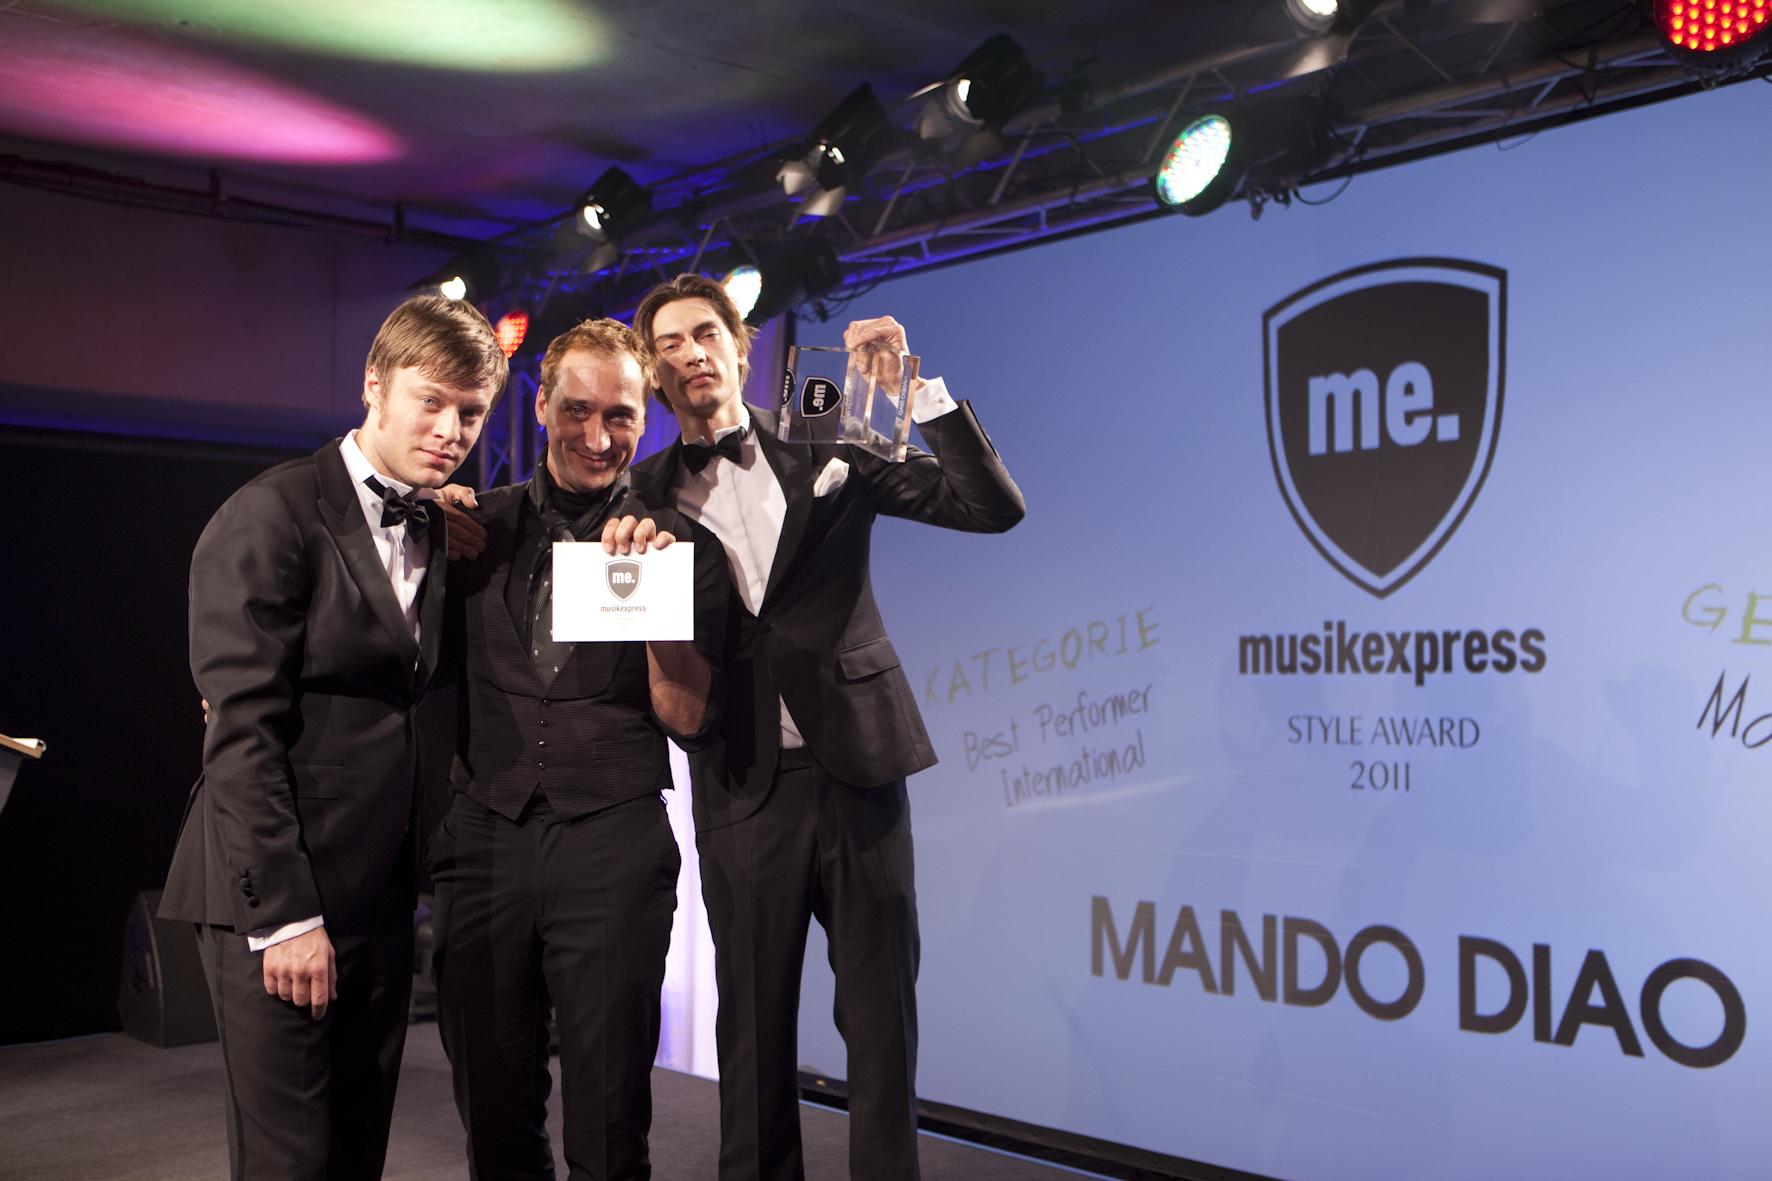 Paul van Dyk mit den Best Performern International: Mando Diao.